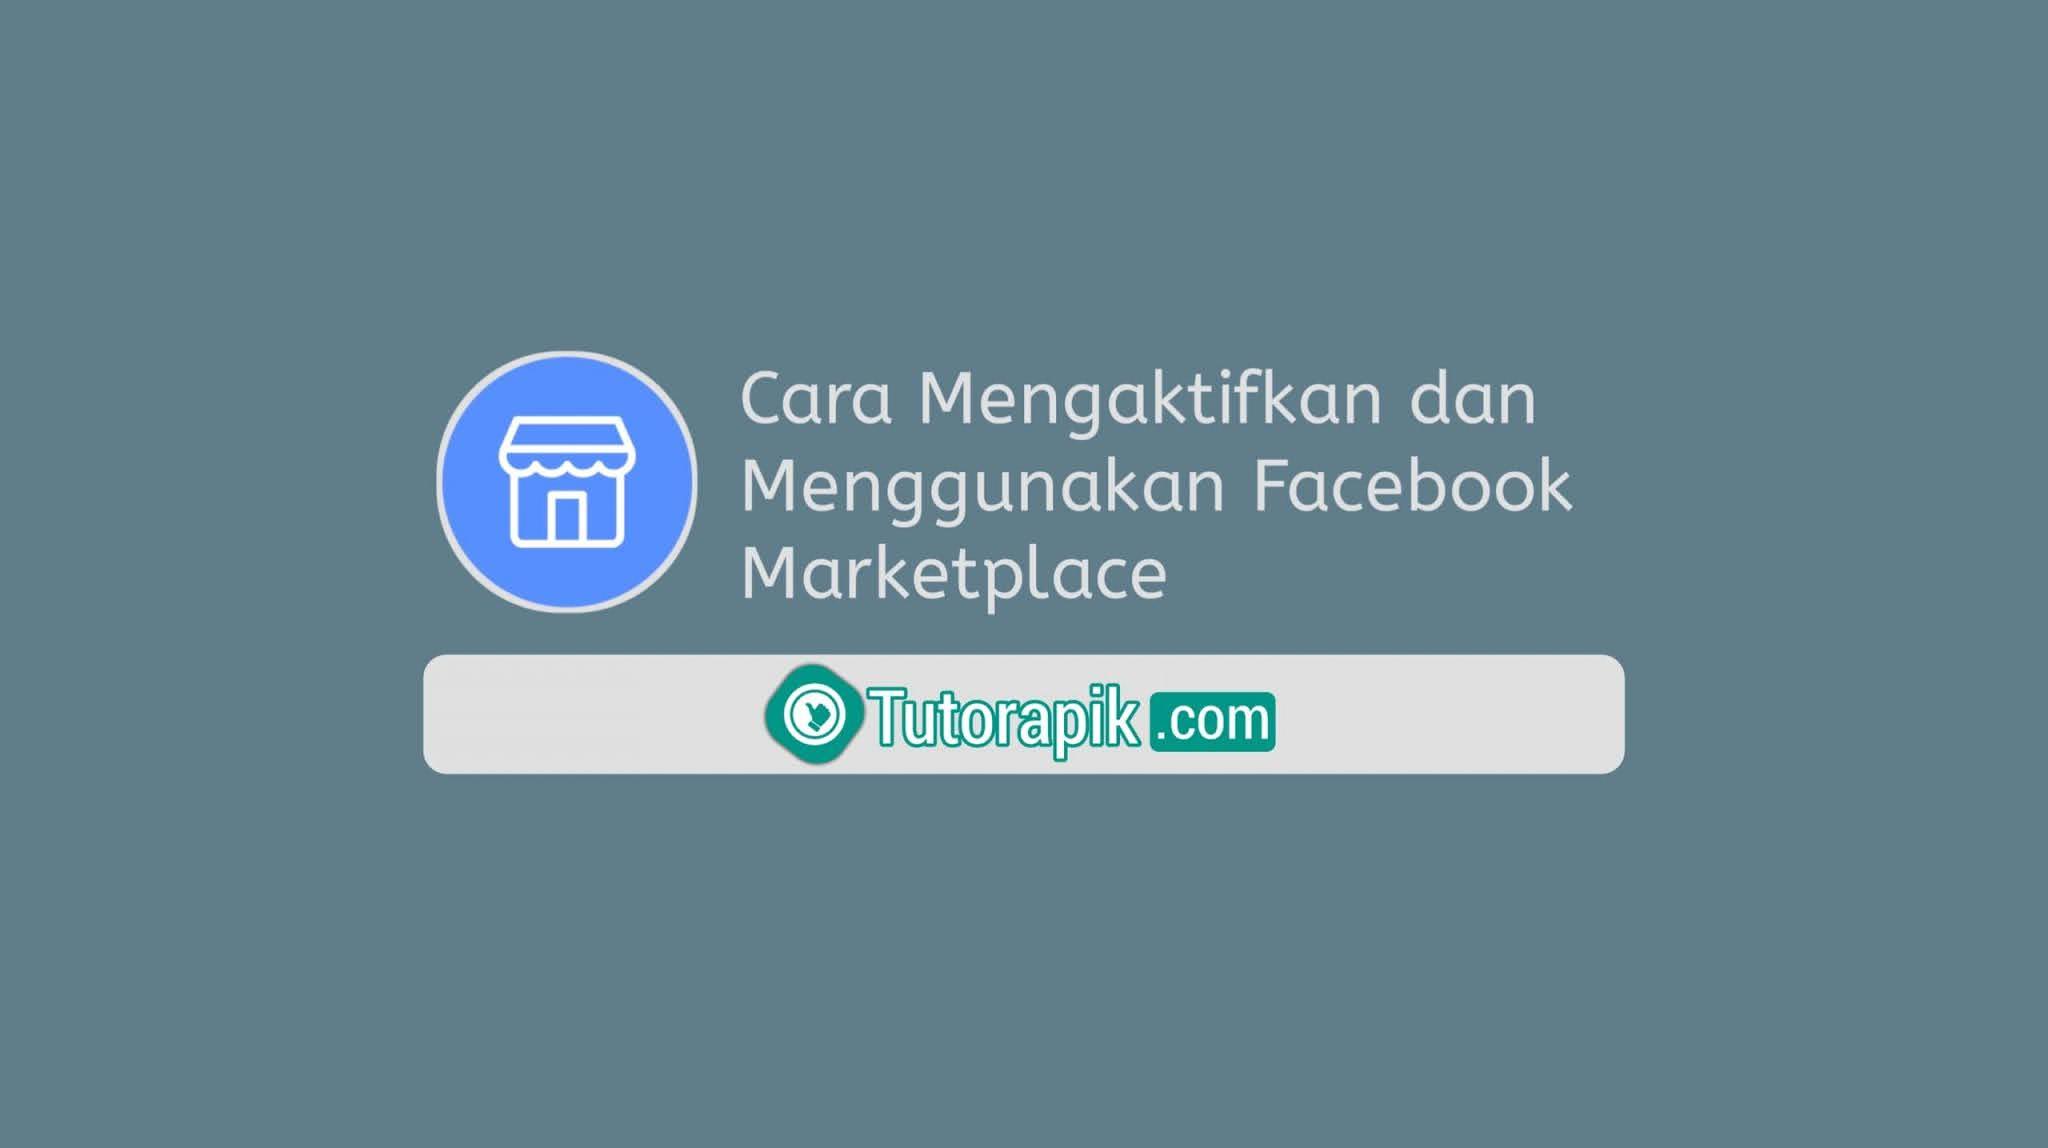 Cara Mengaktifkan dan Menggunakan Facebook Marketplace